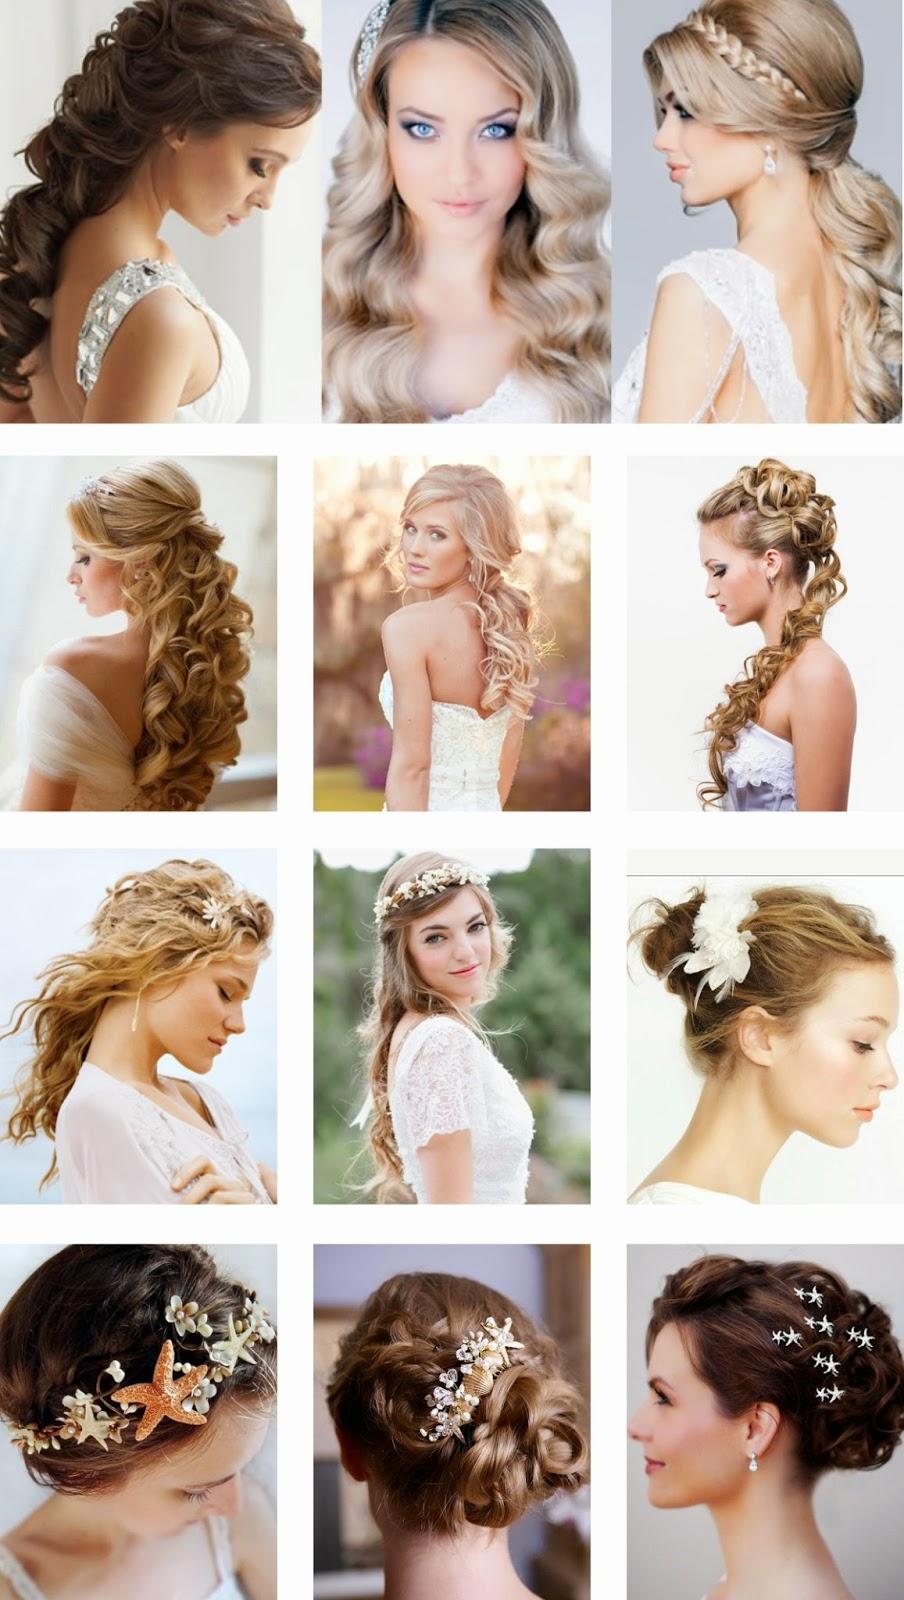 Peinados de novia boda en la playa